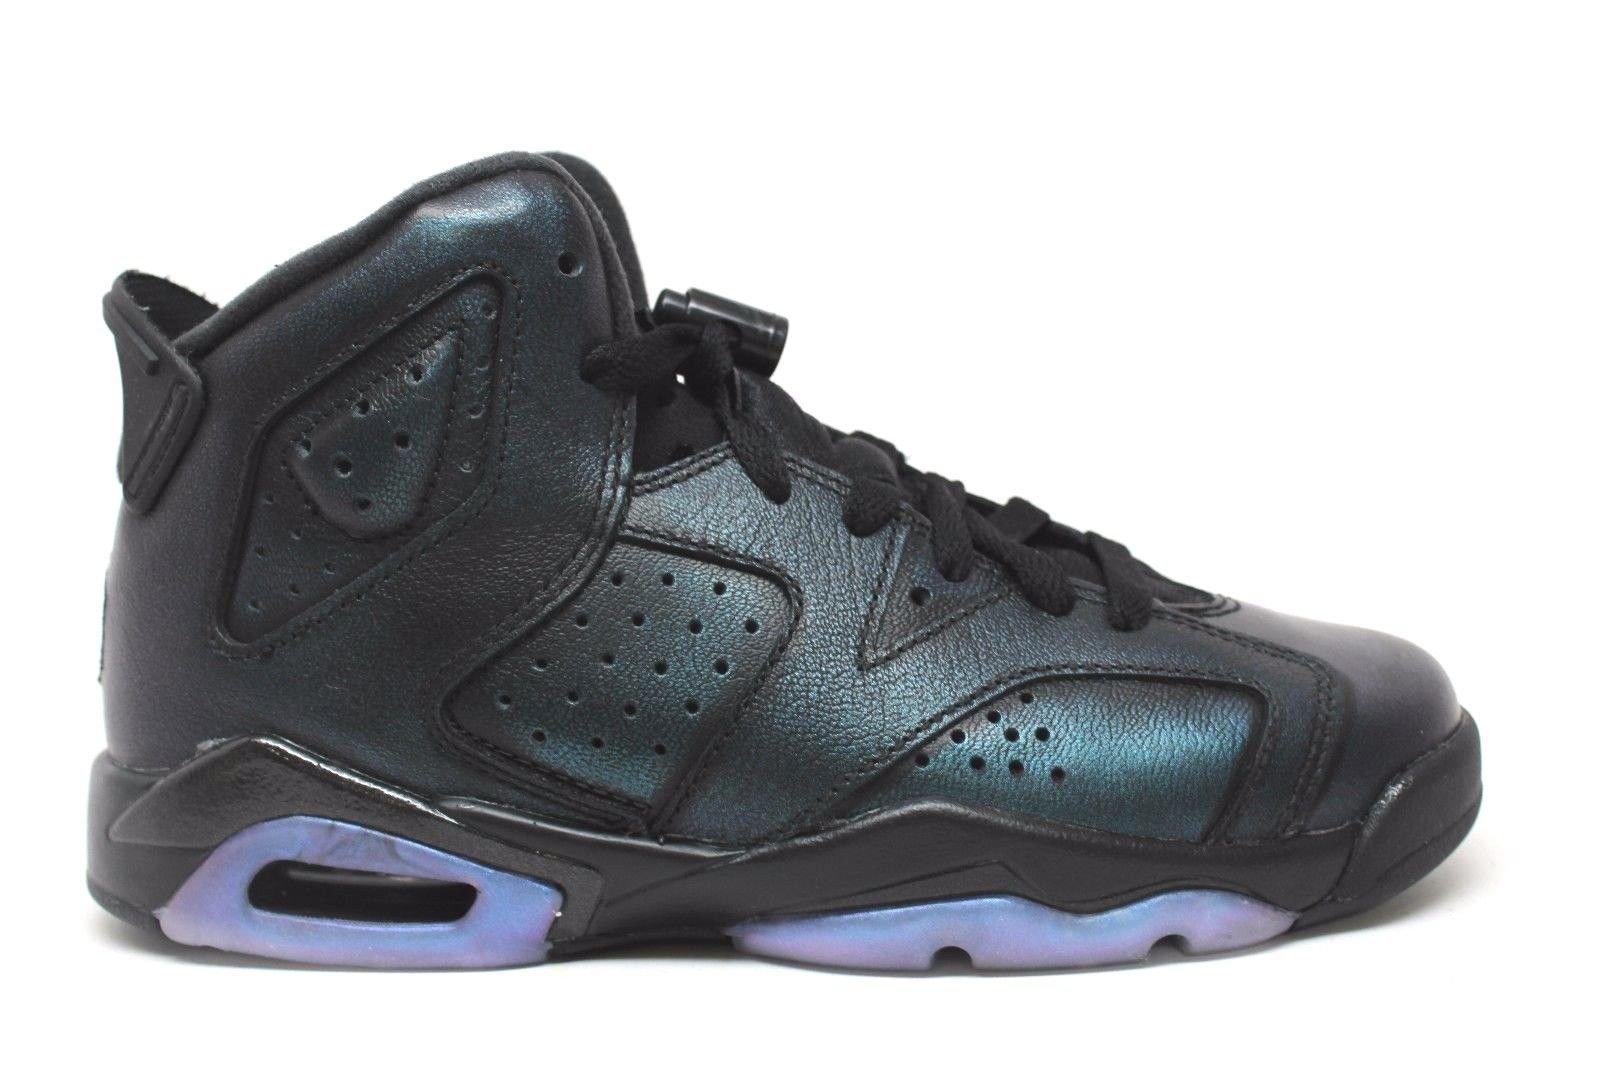 Nike Jordan Kids Air Jordan 6 Retro AS BG Black/Black White Basketball Shoe 4 Kids US by Jordan